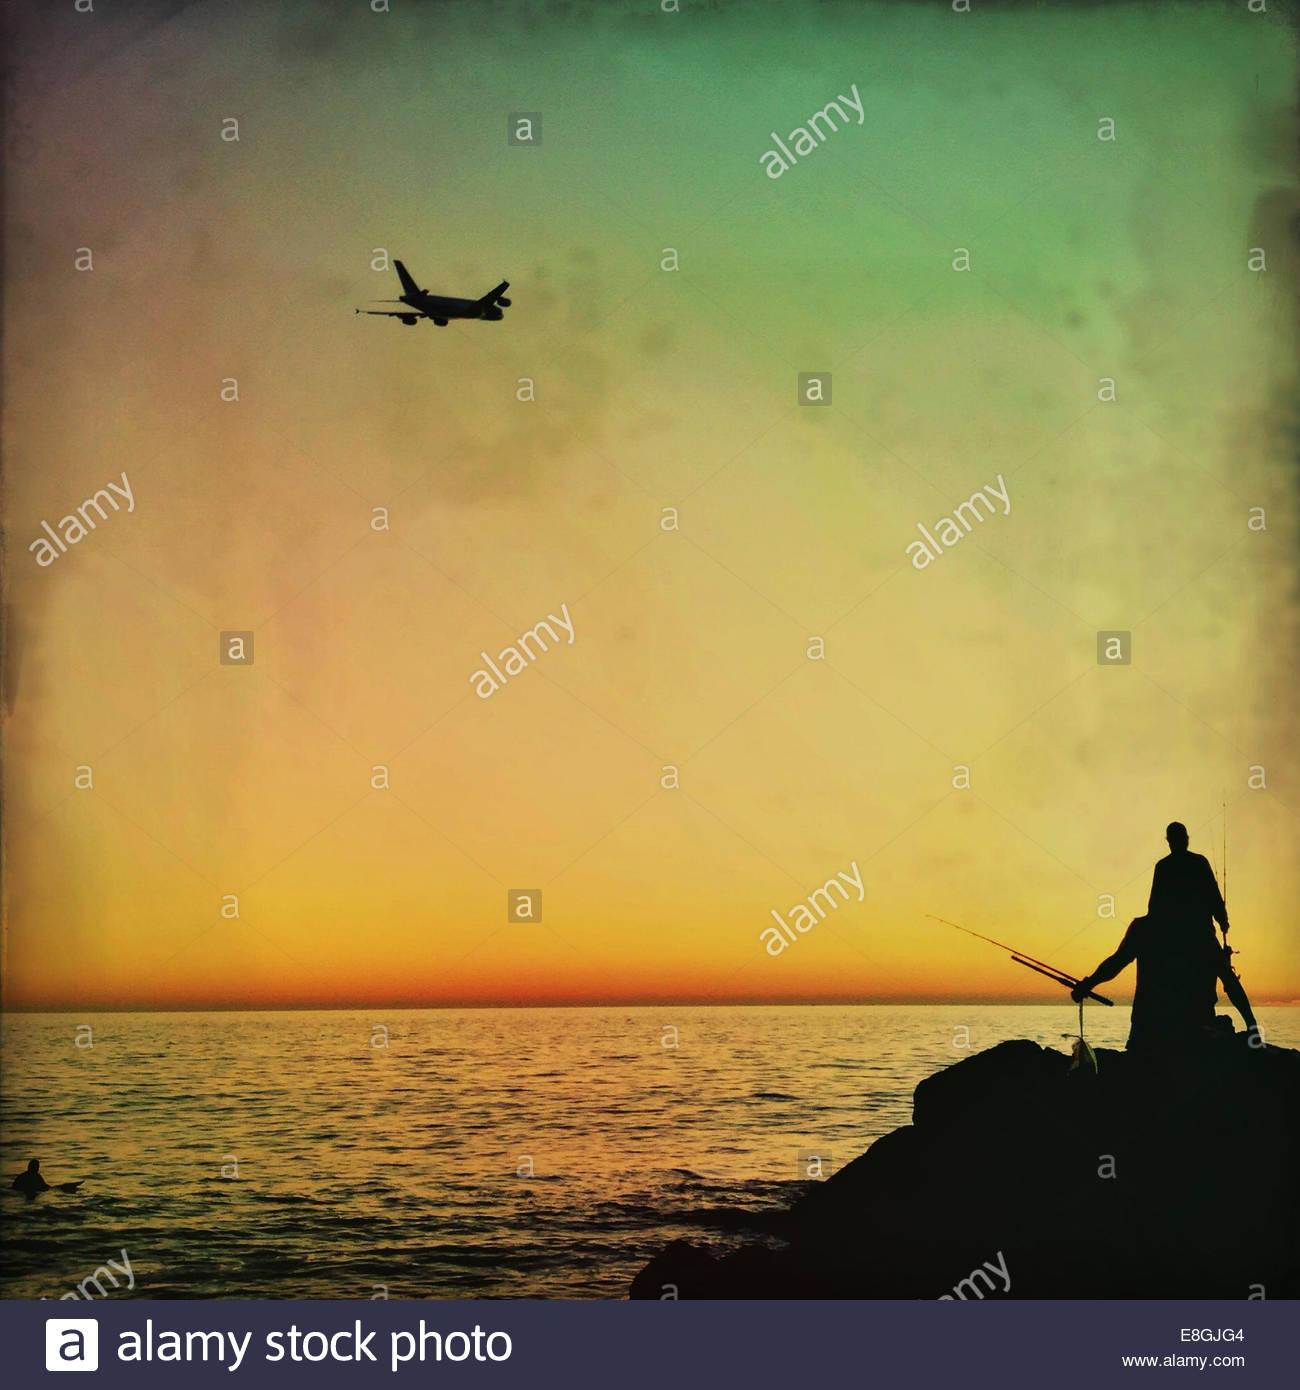 Airplane above fishermen - Stock Image